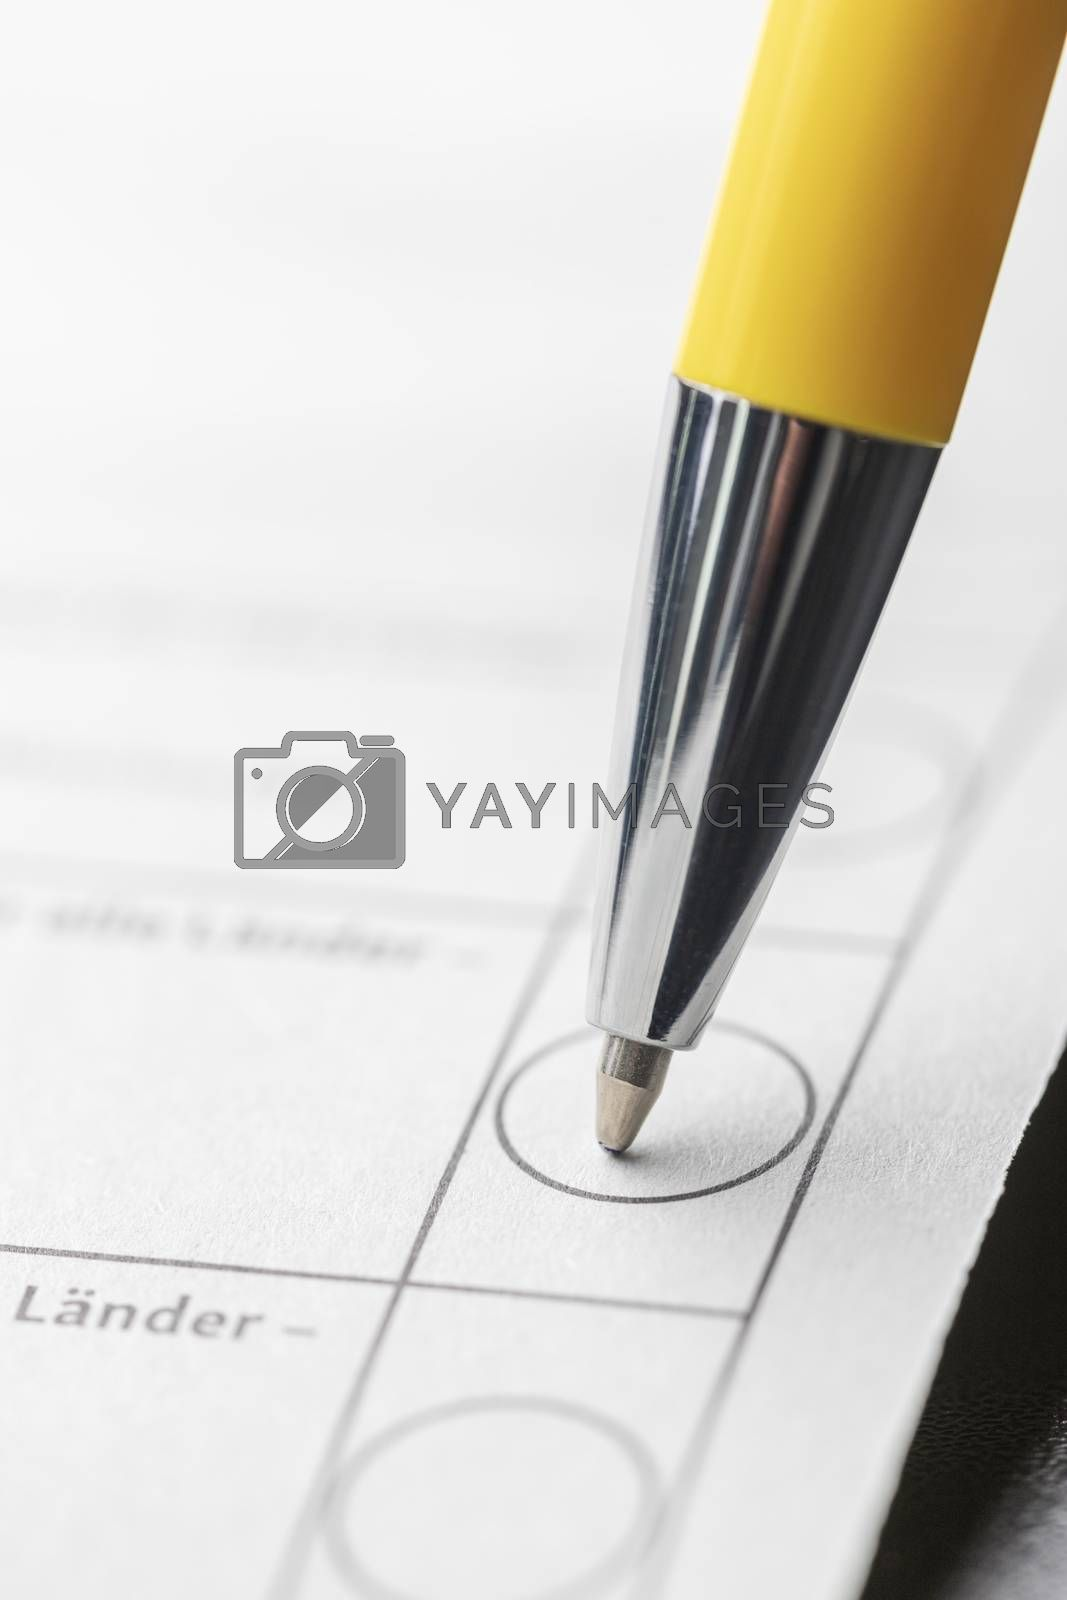 closeup of a pen on ballot paper